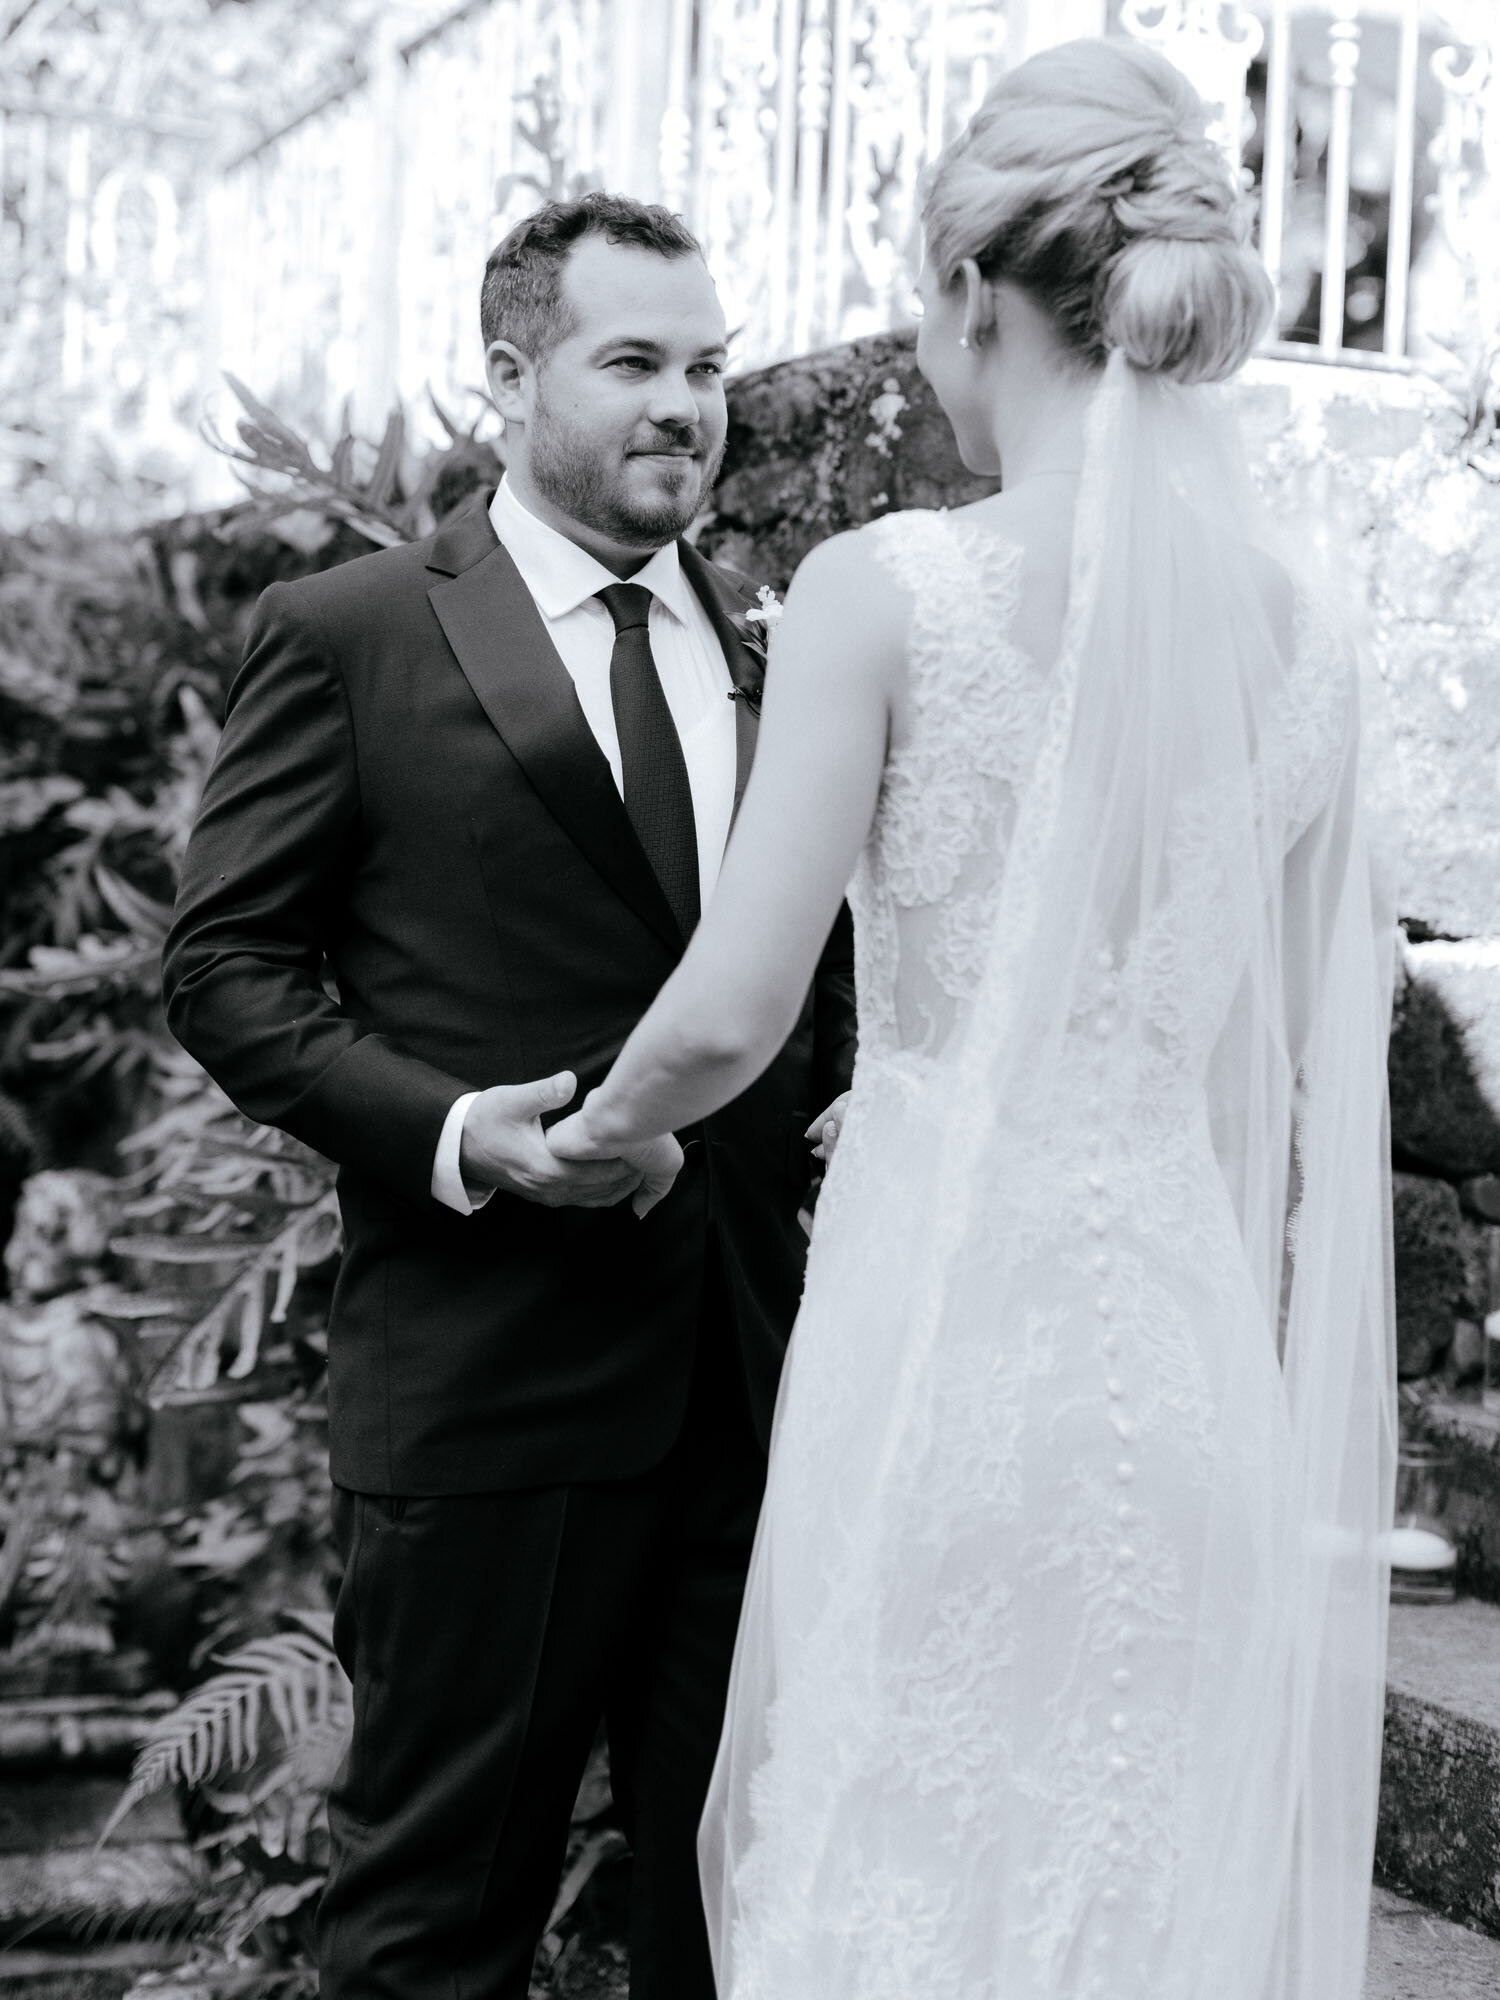 Chris-J-Evans-Maui-Wedding-Kim&Brian2358.jpg